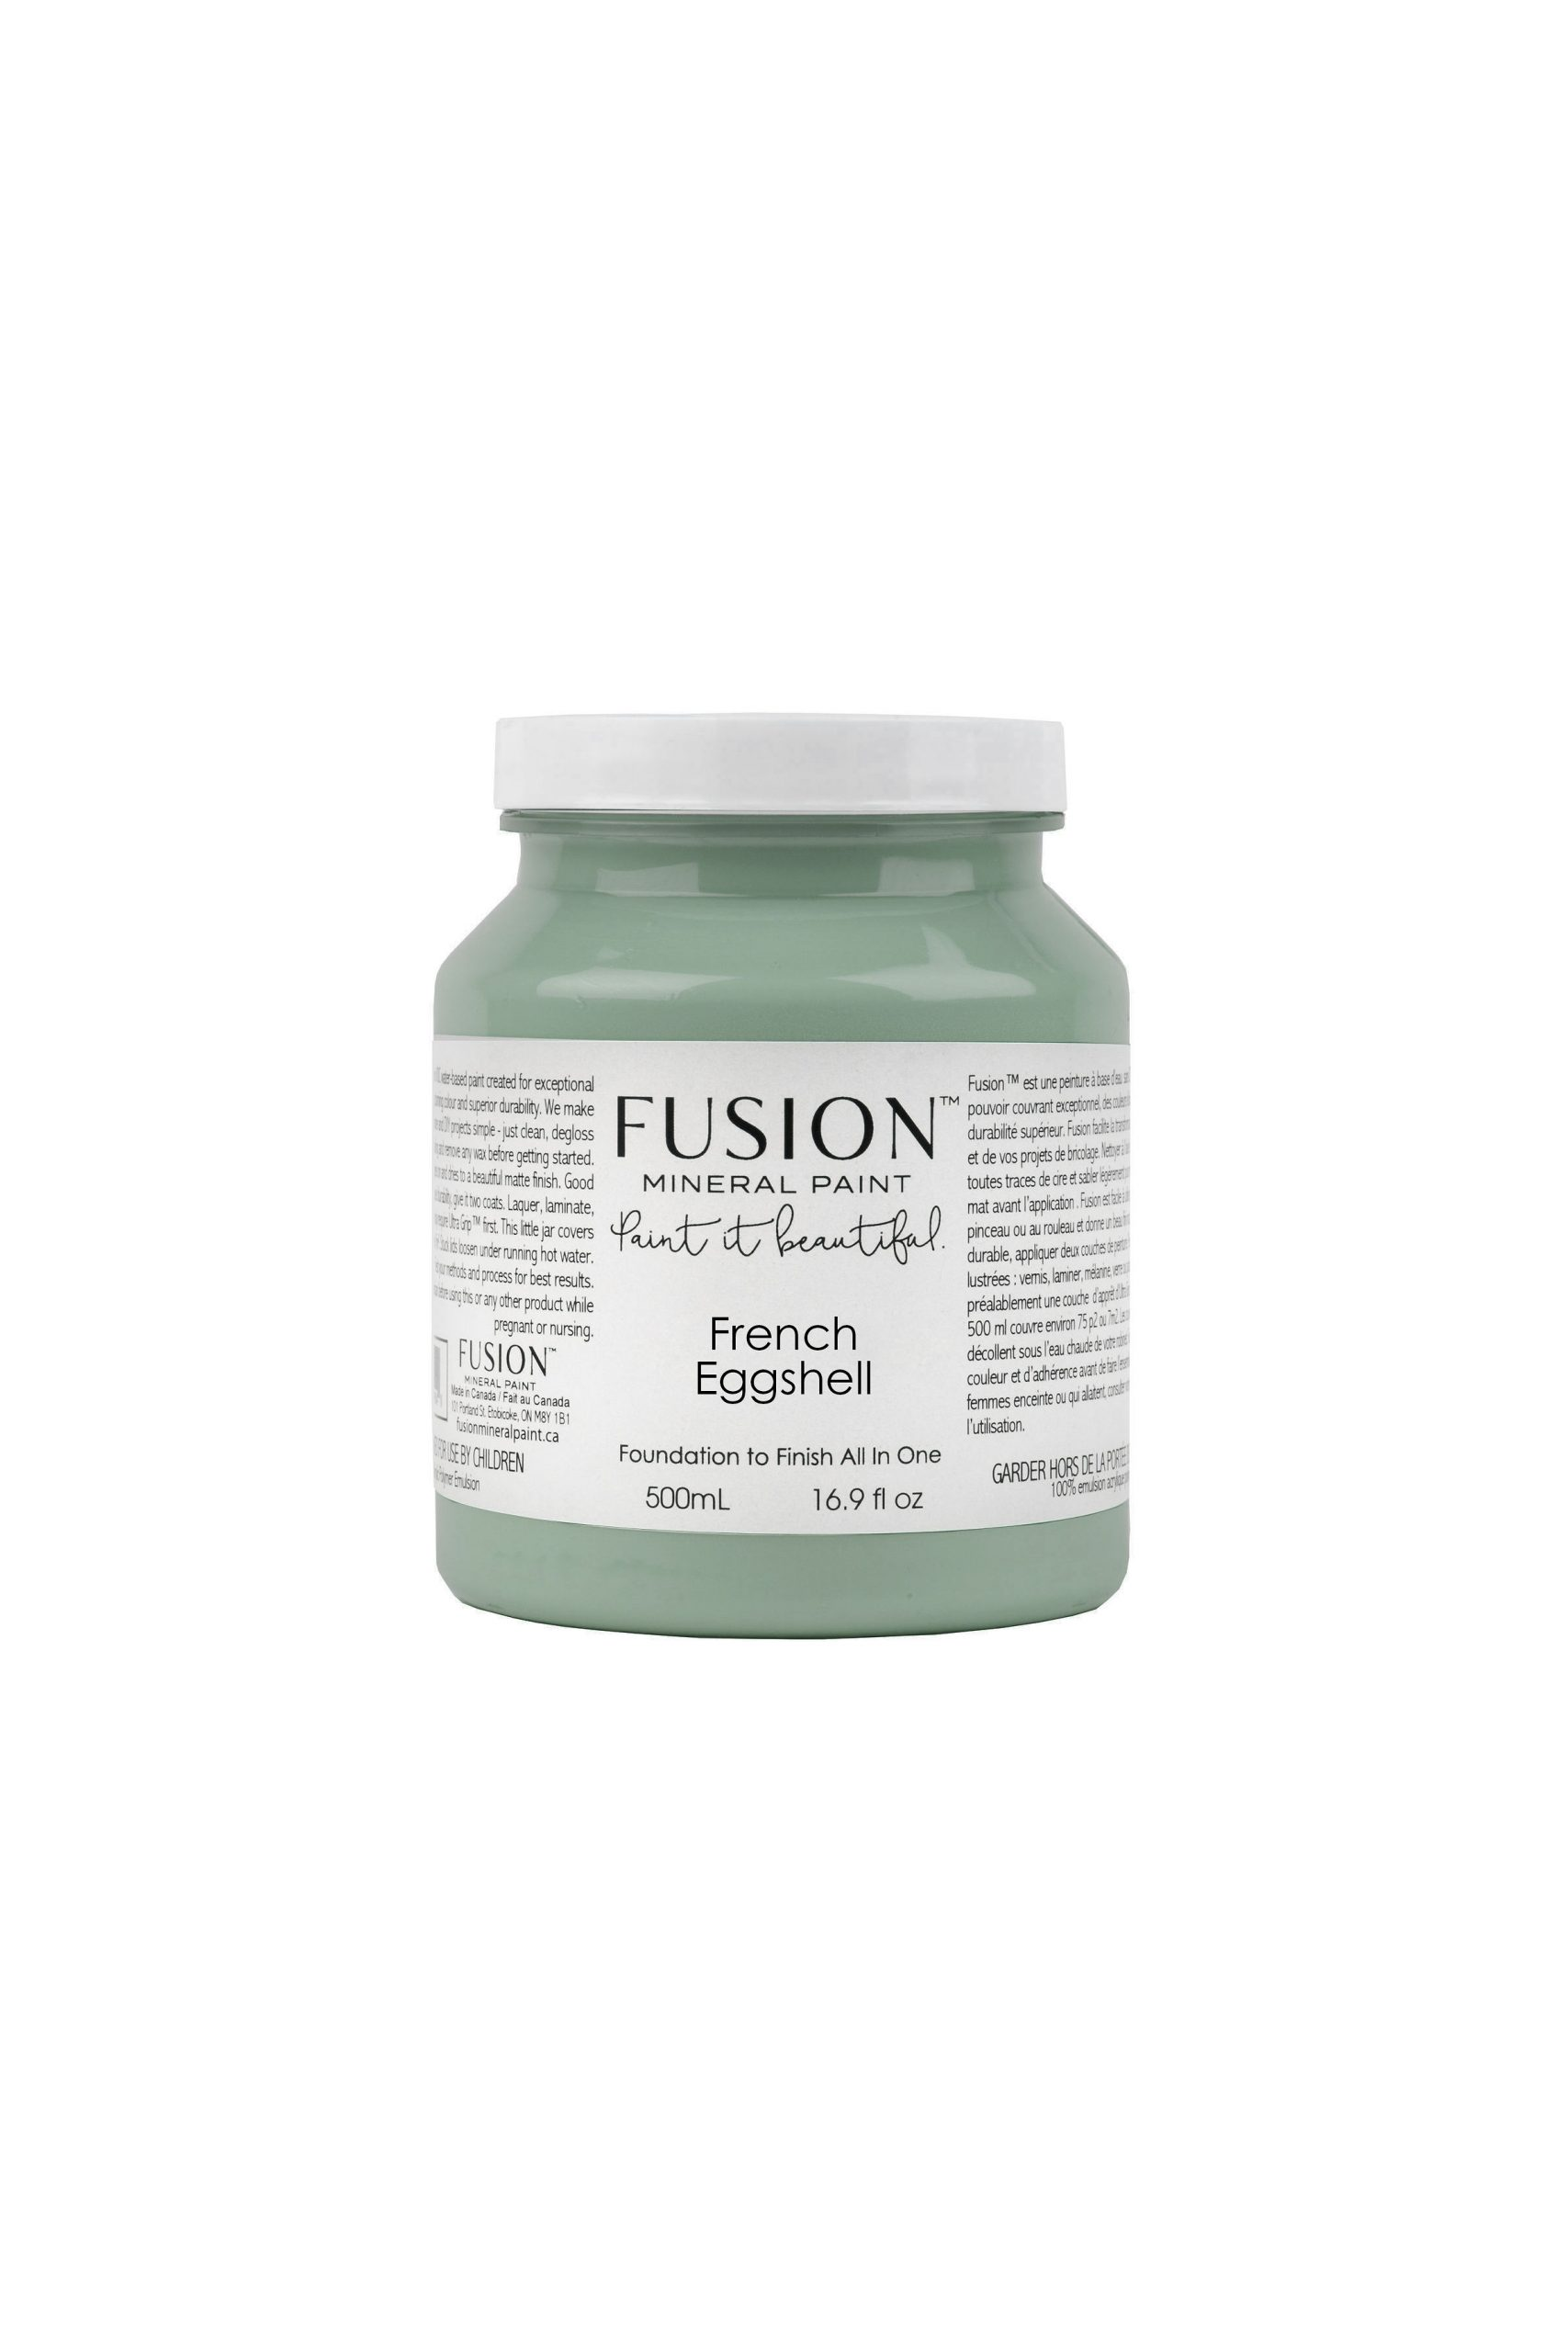 frensch eggshell fusion pint